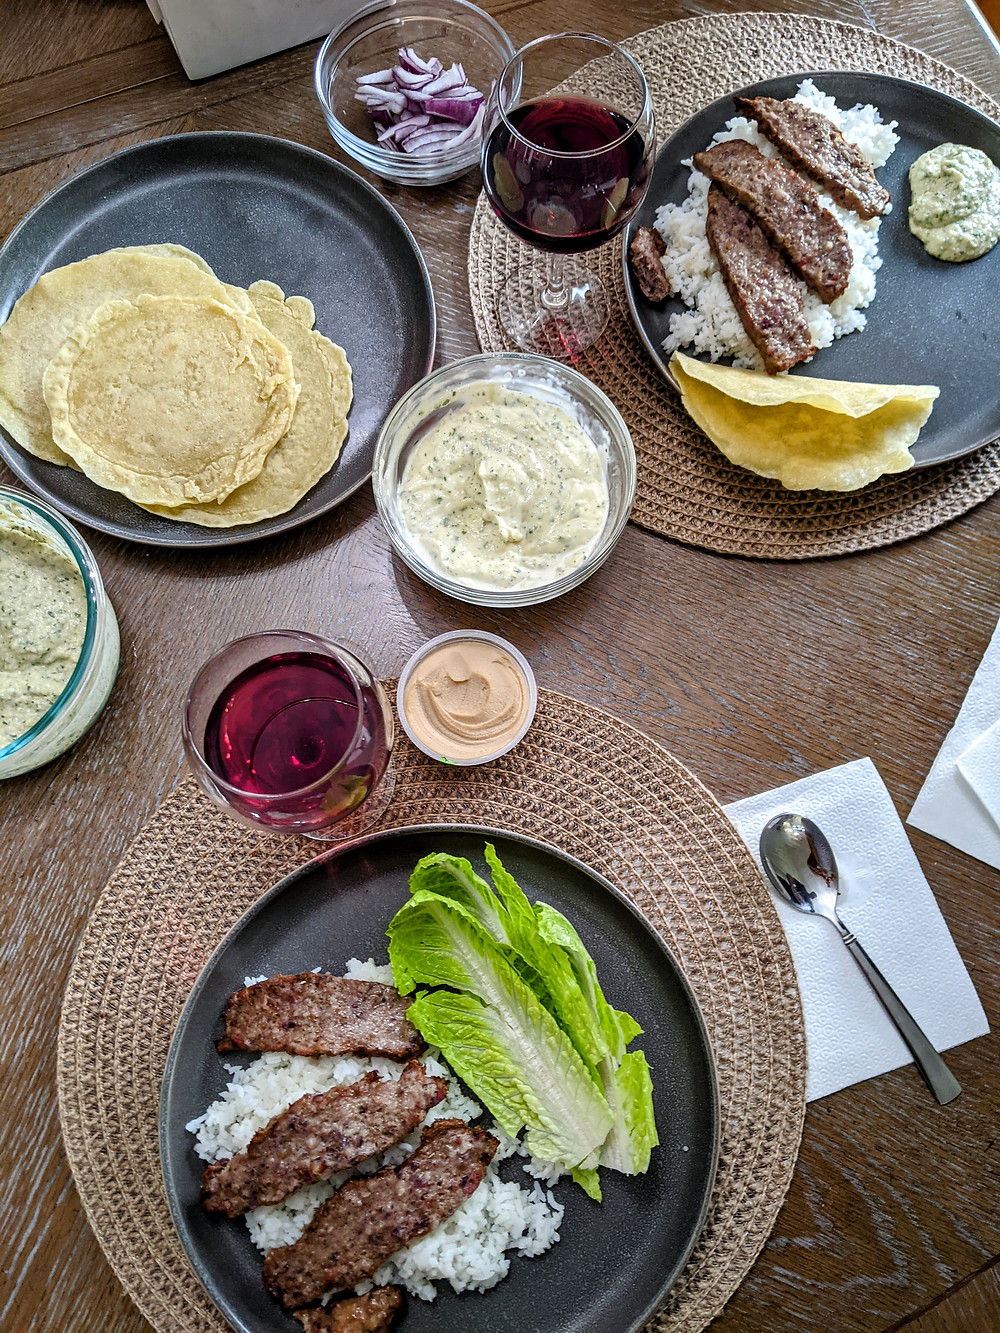 Shawarma-style Lamb over Rice with White Sauce and Gluten-Free Pita Bread - The Sunday Cookbook - Joseph Centineo